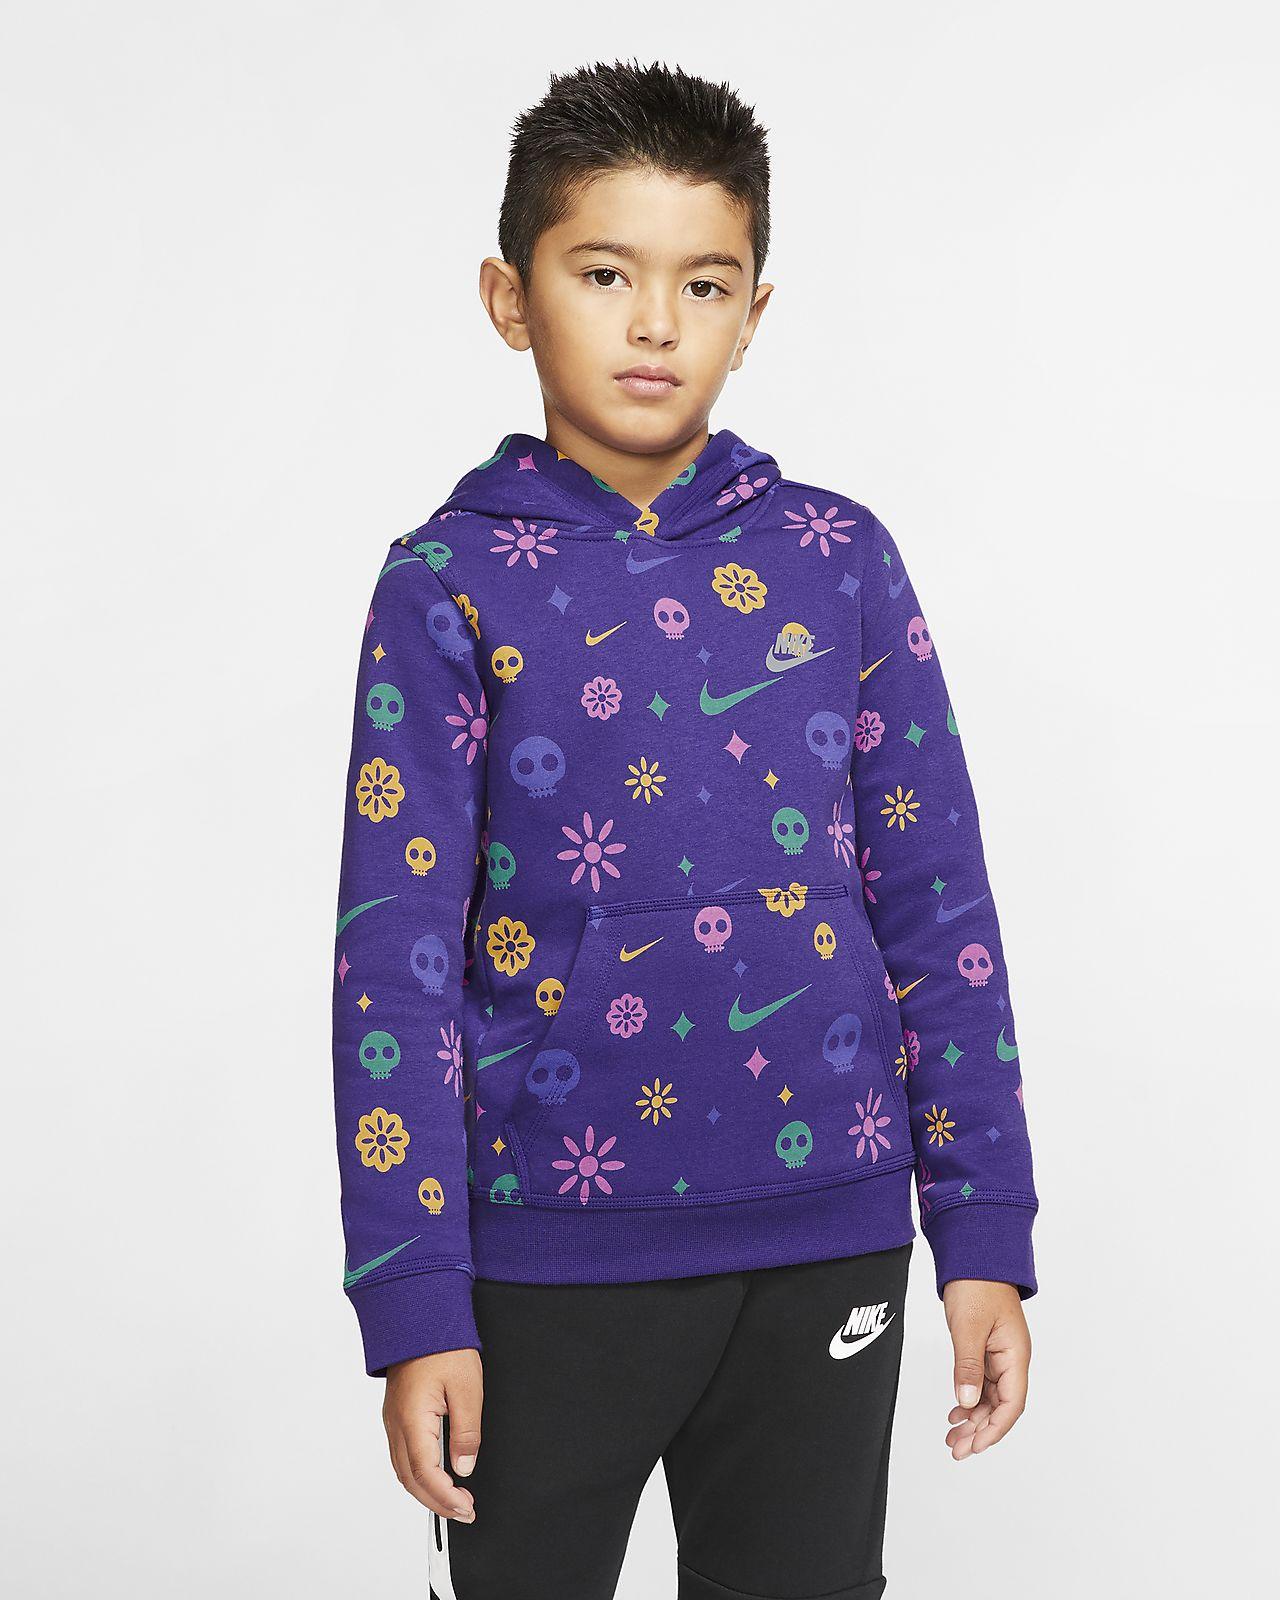 Nike Sportswear Boys' Club Pullover Hoodie